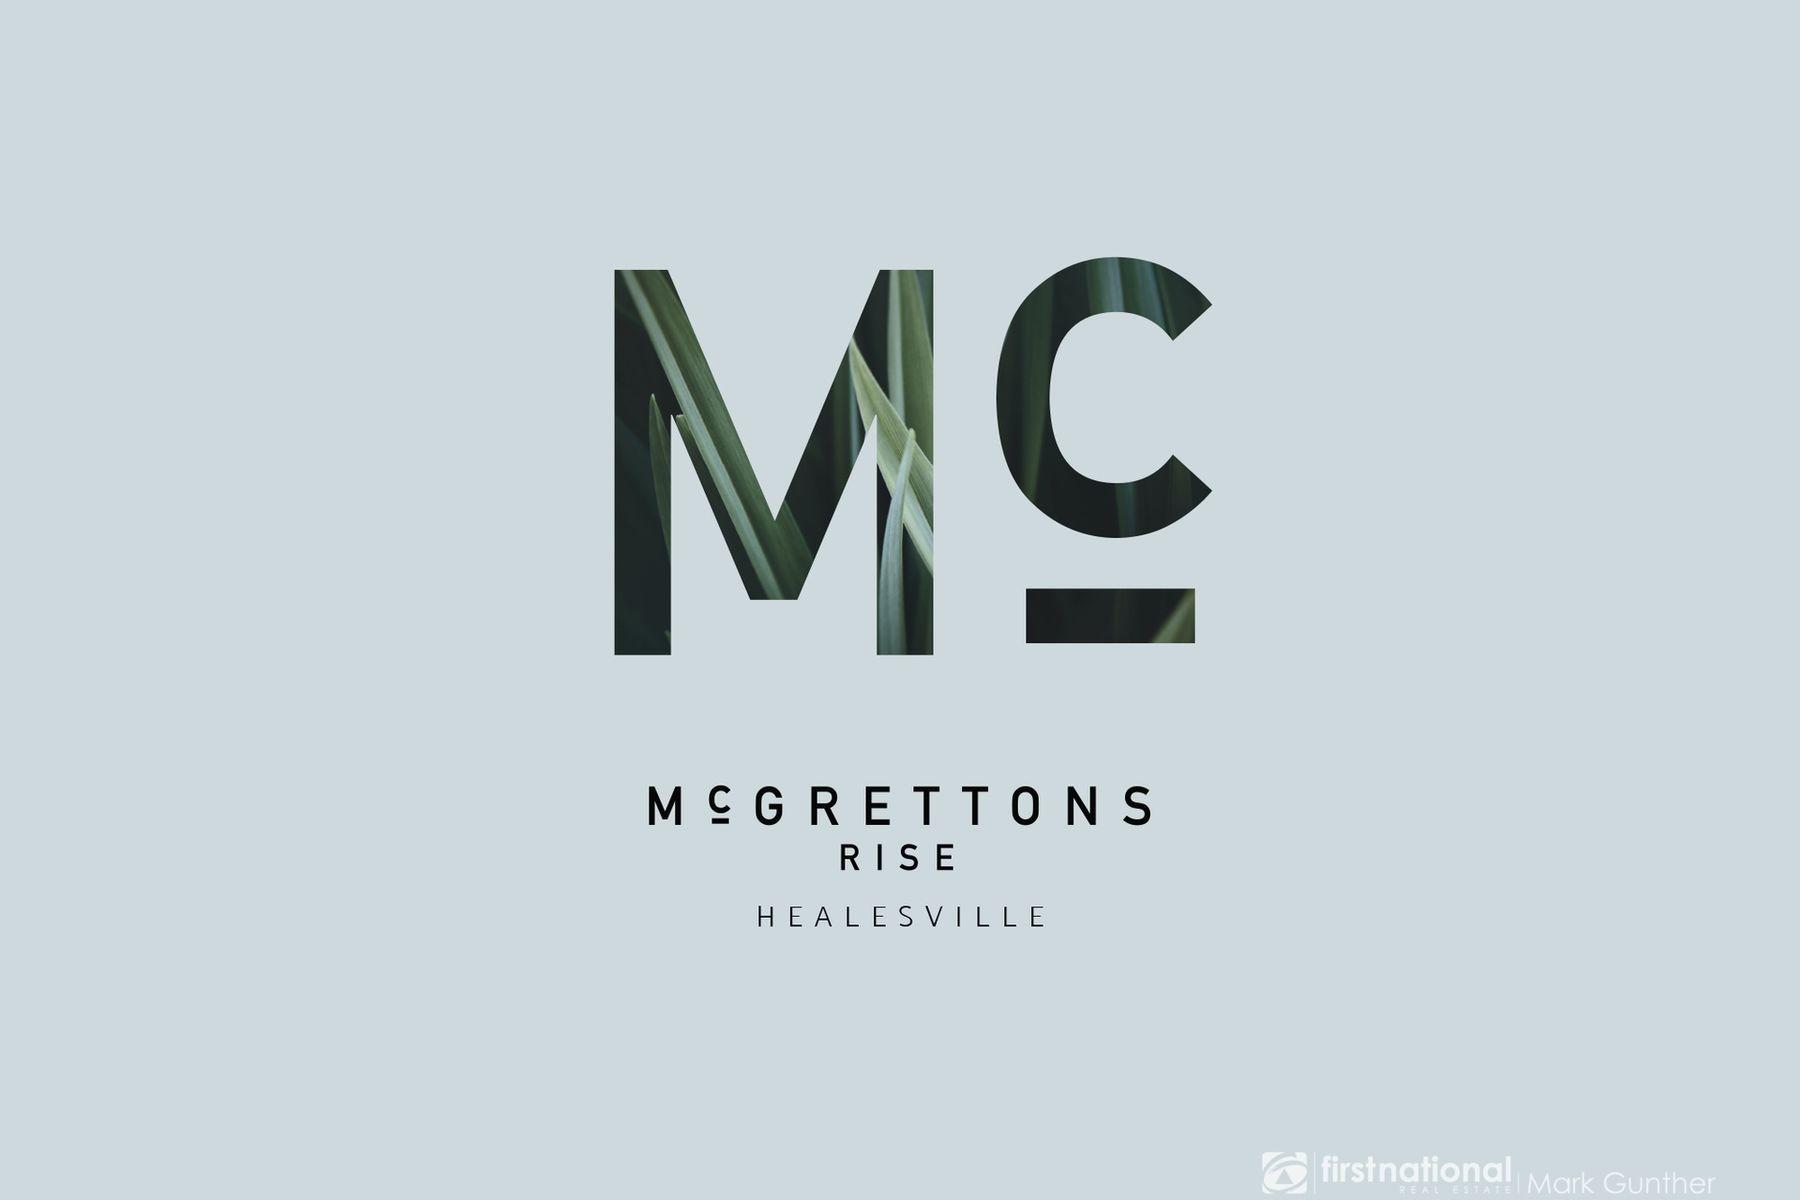 Lot 12/29 Mcgrettons Road, Healesville, VIC 3777